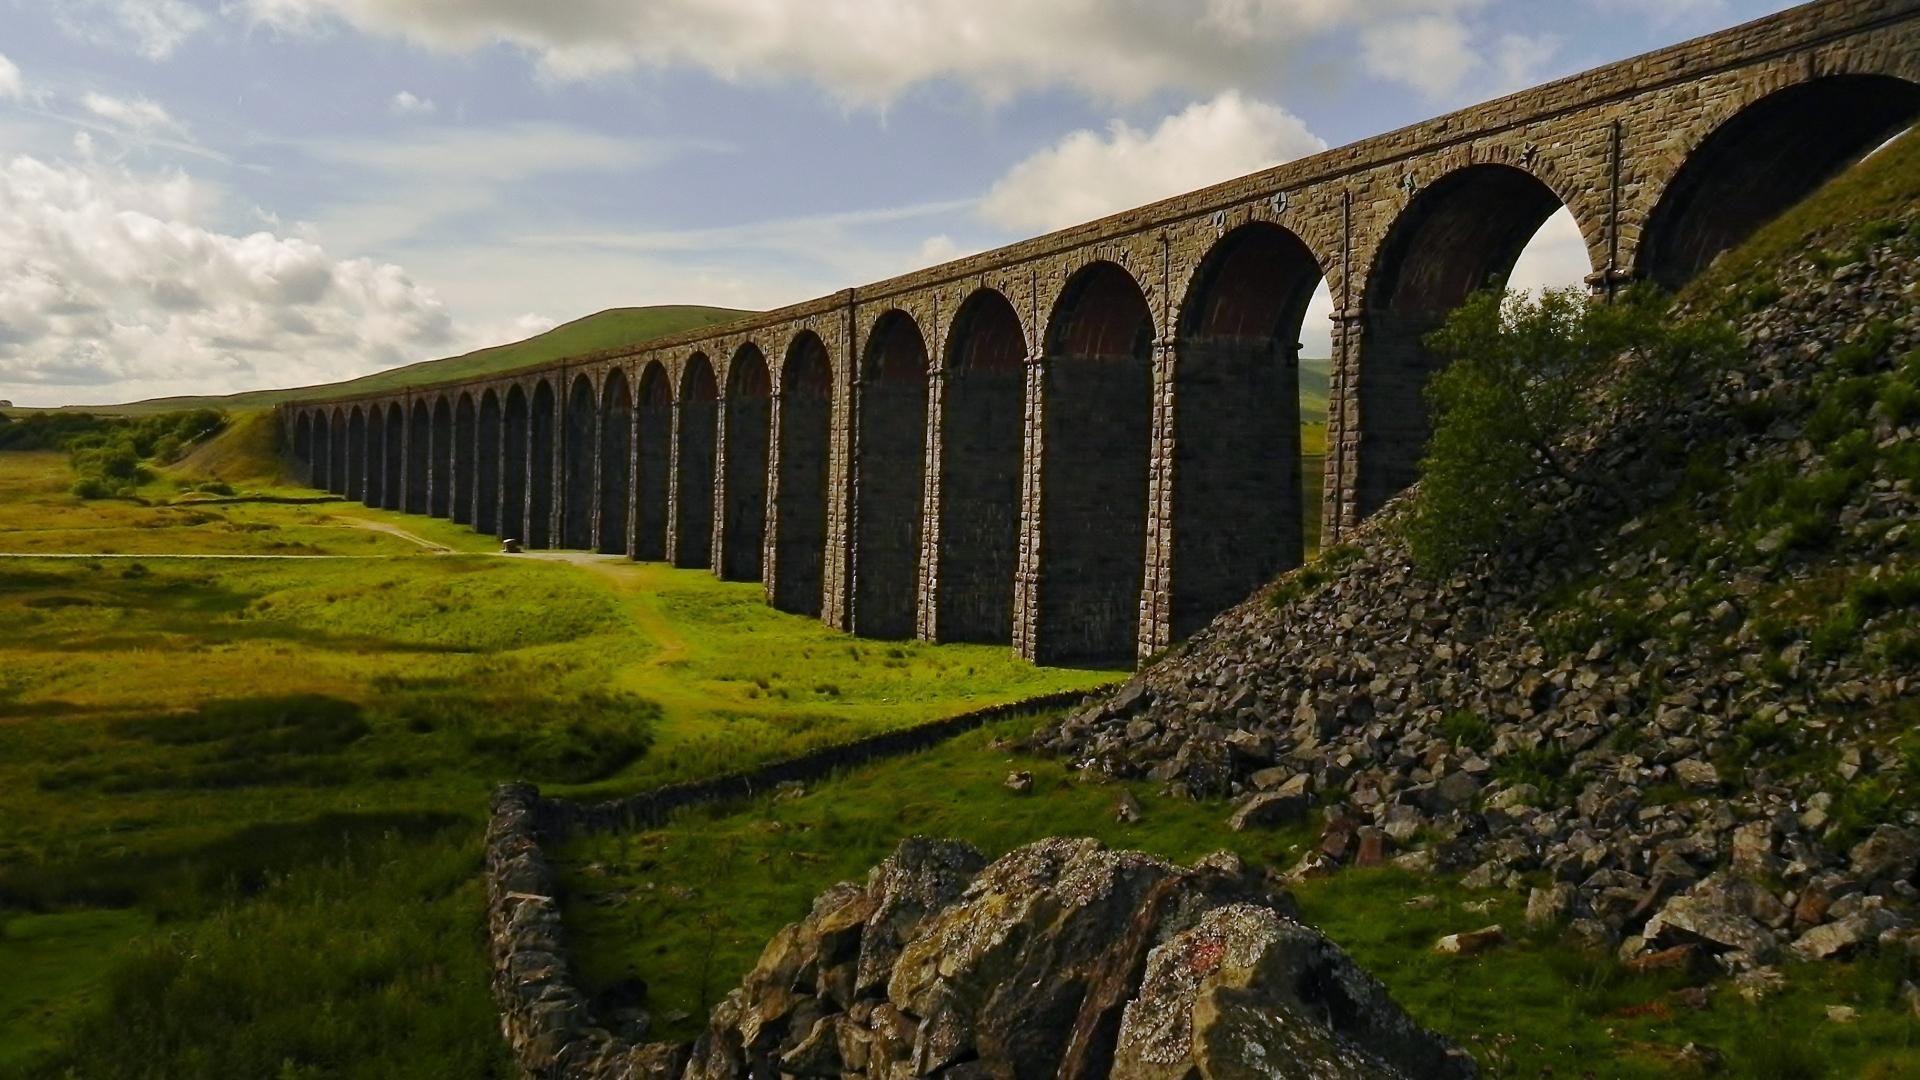 Steam Train Glenfinnan Viaduct Is A Railway Viaduct On The West